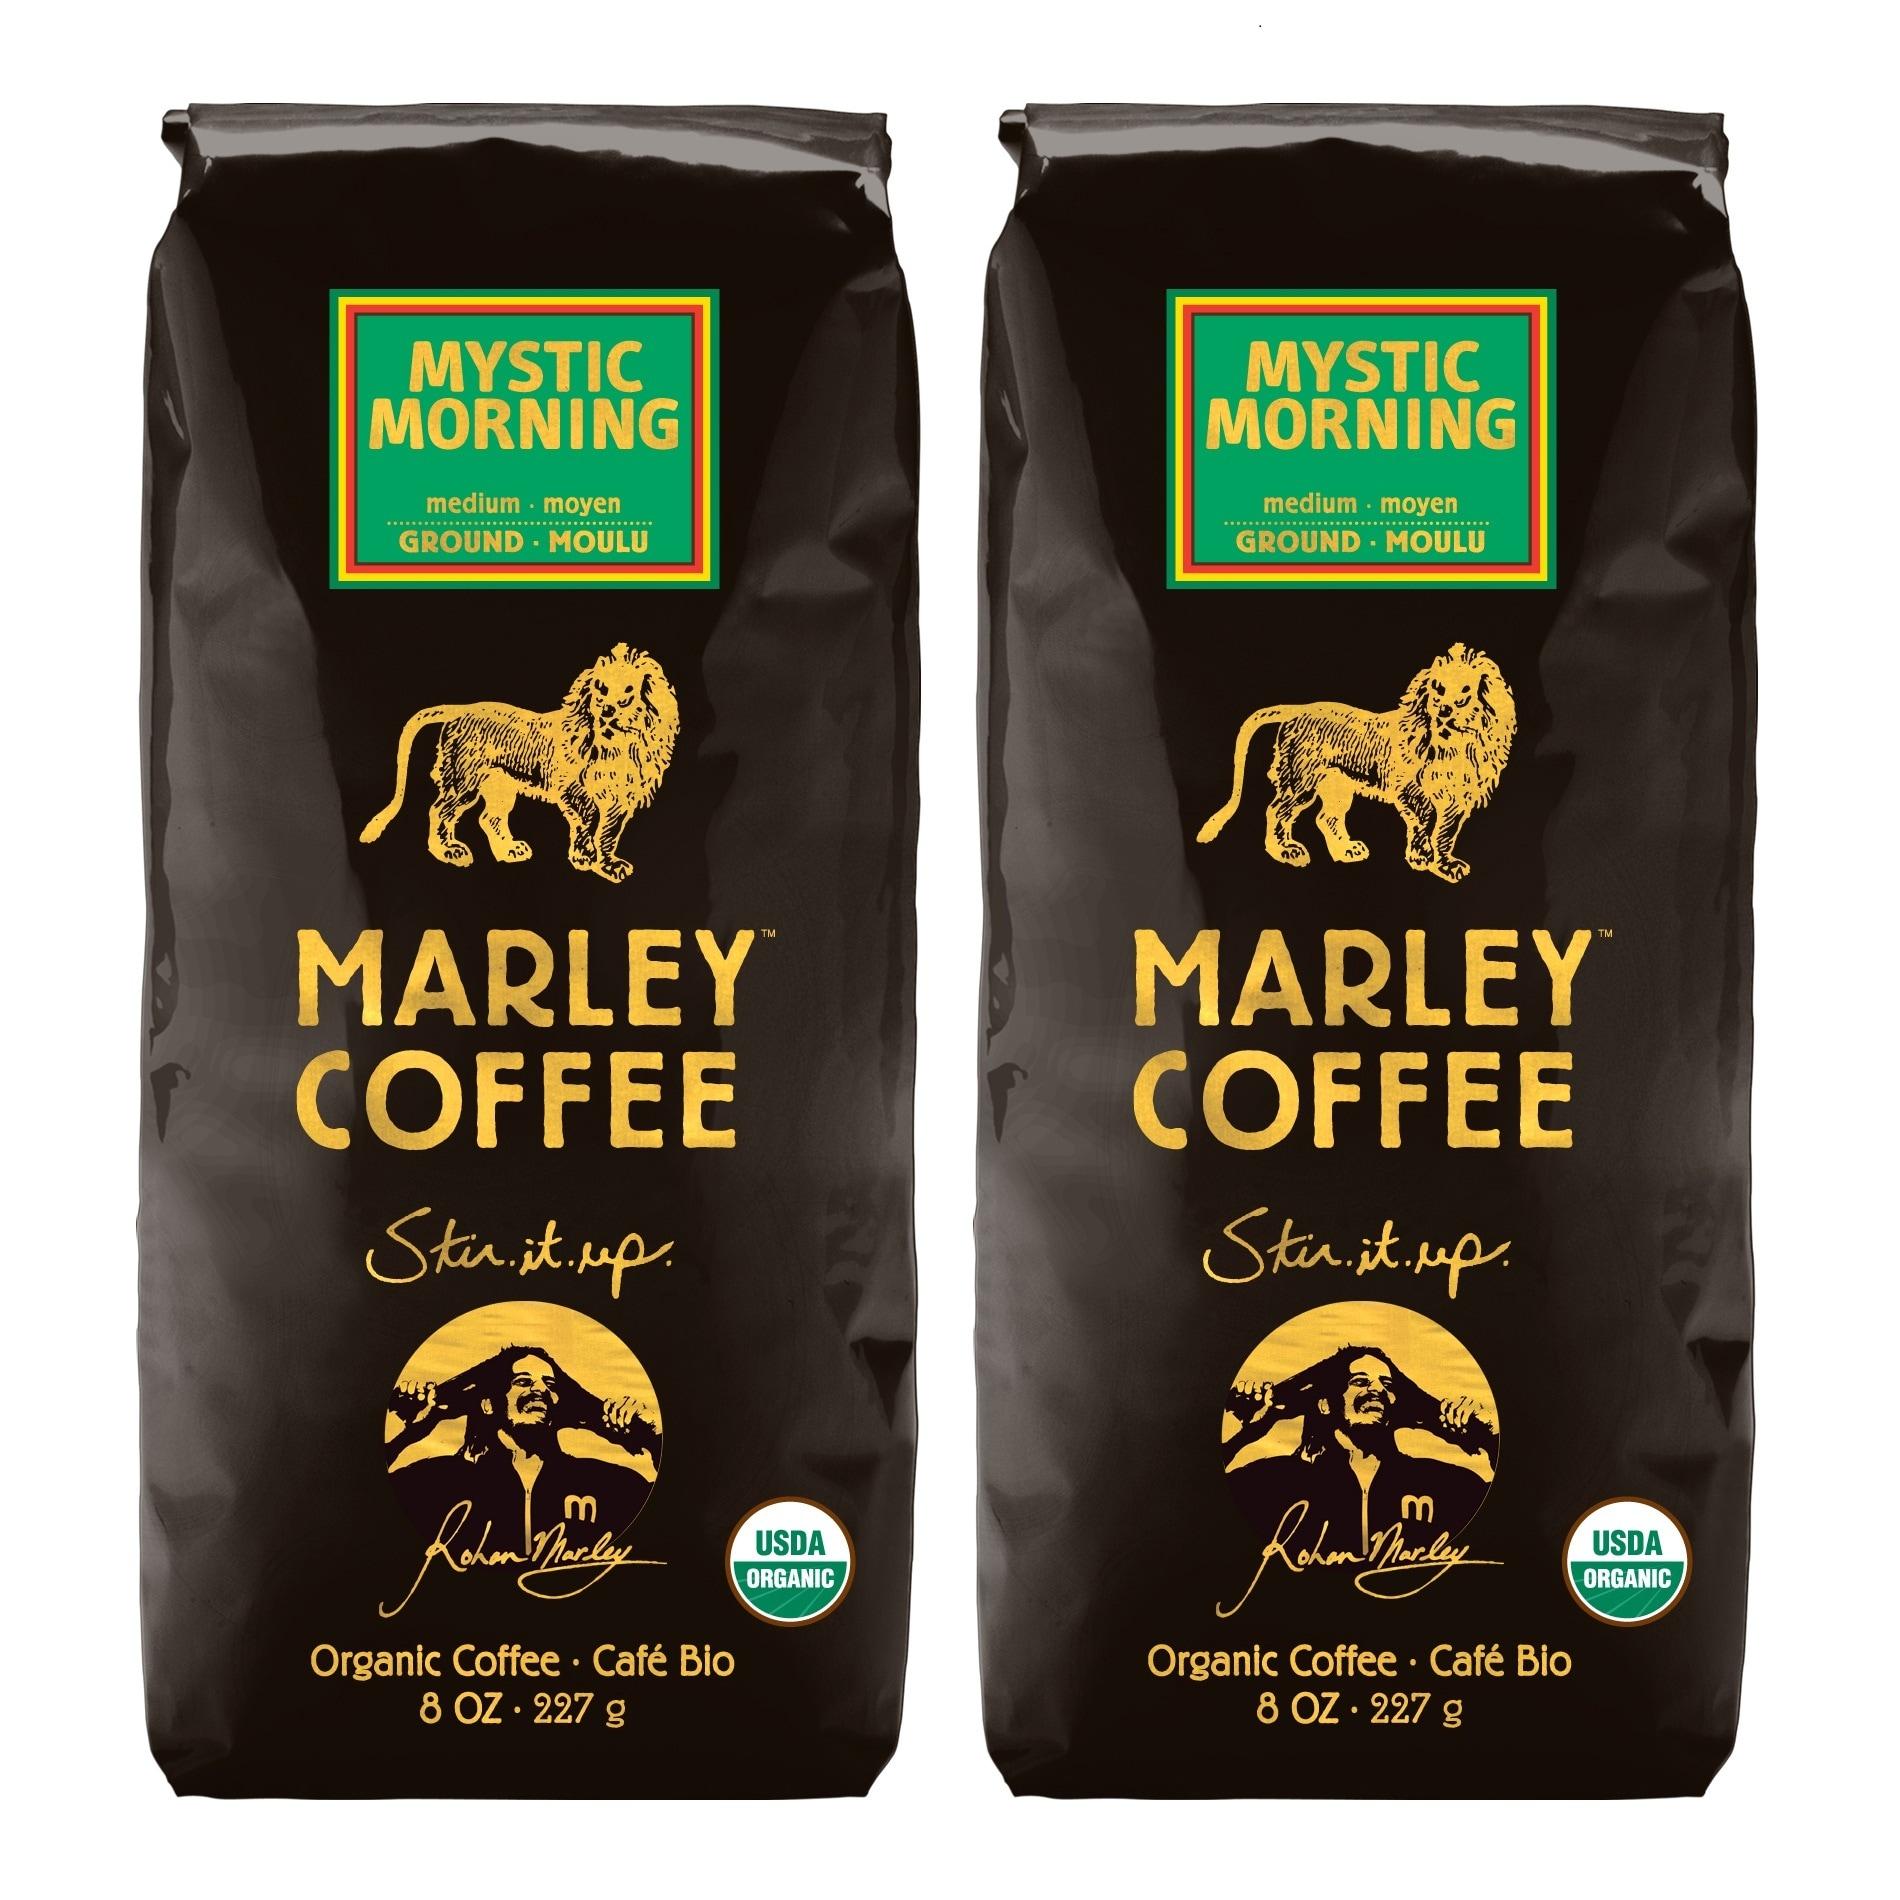 Marley Coffee Mystic Morning Ground Coffee (1 Pound)